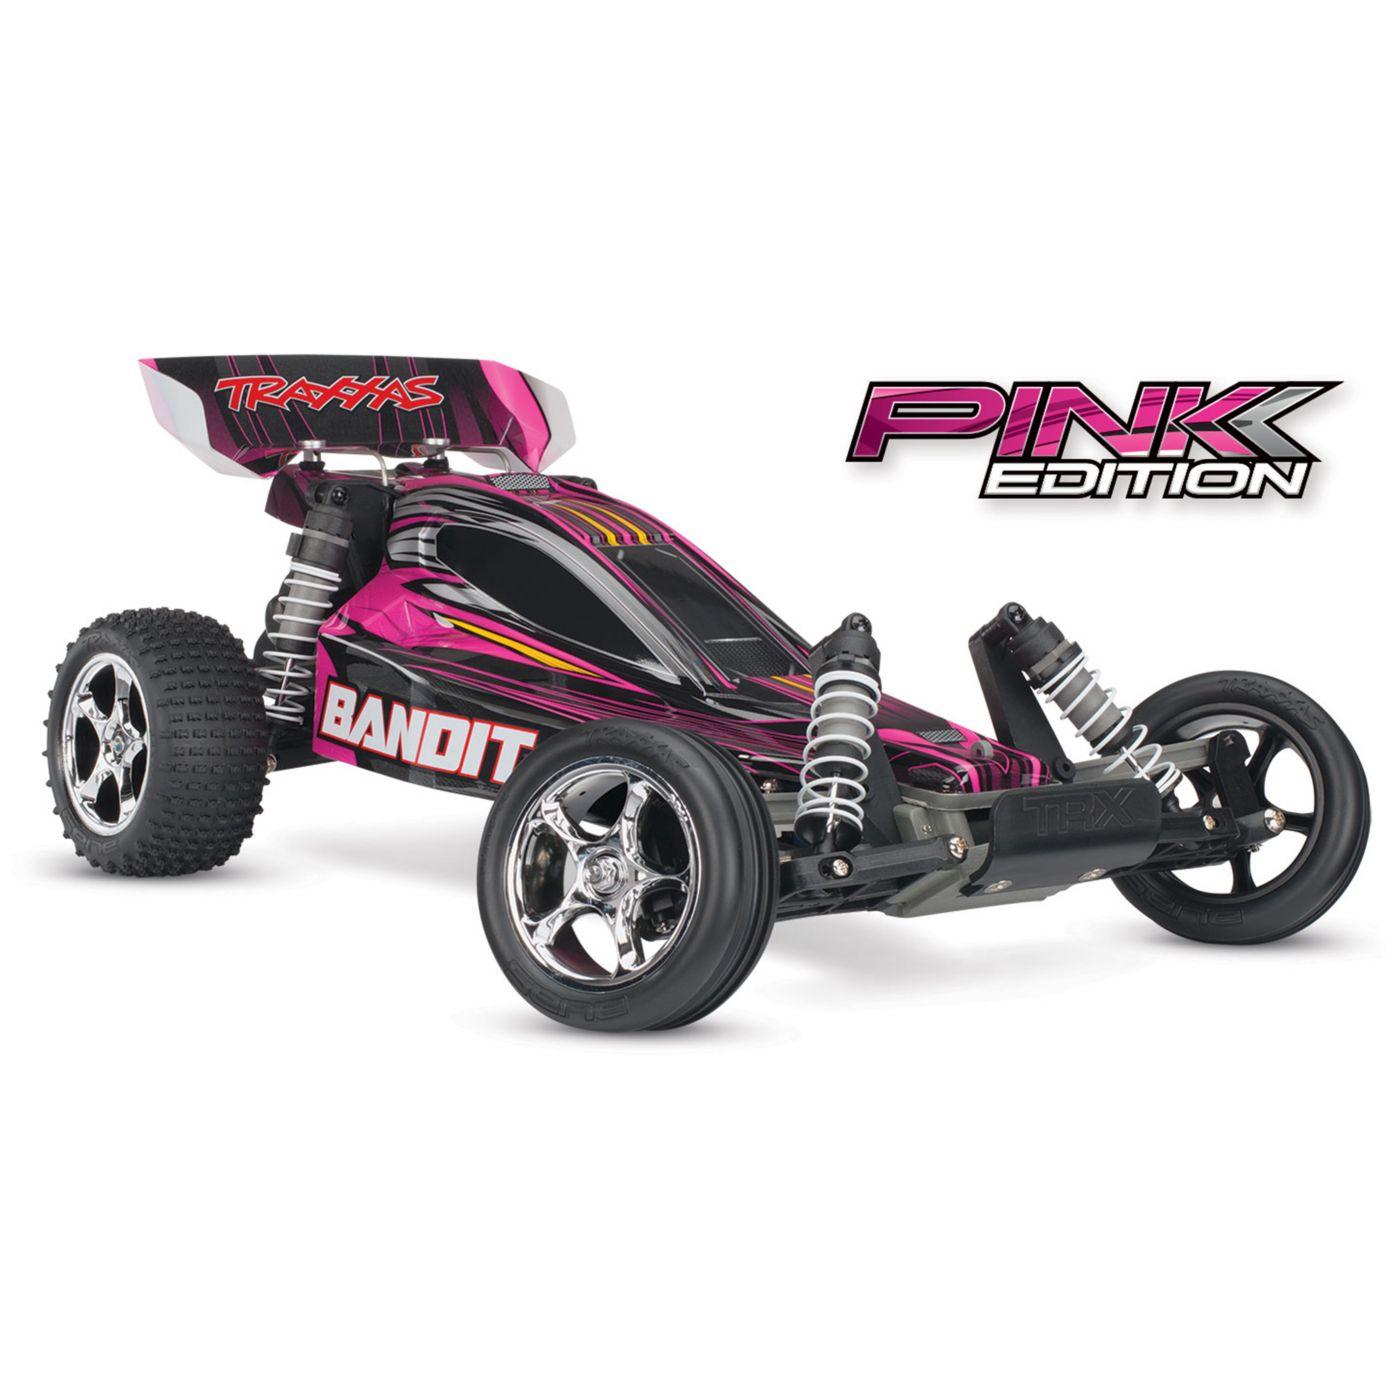 1 10 bandit xl 5 2wd buggy brushed rtr pink edition horizonhobby rh horizonhobby com Traxxas Slayer traxxas bandit vxl owners manual